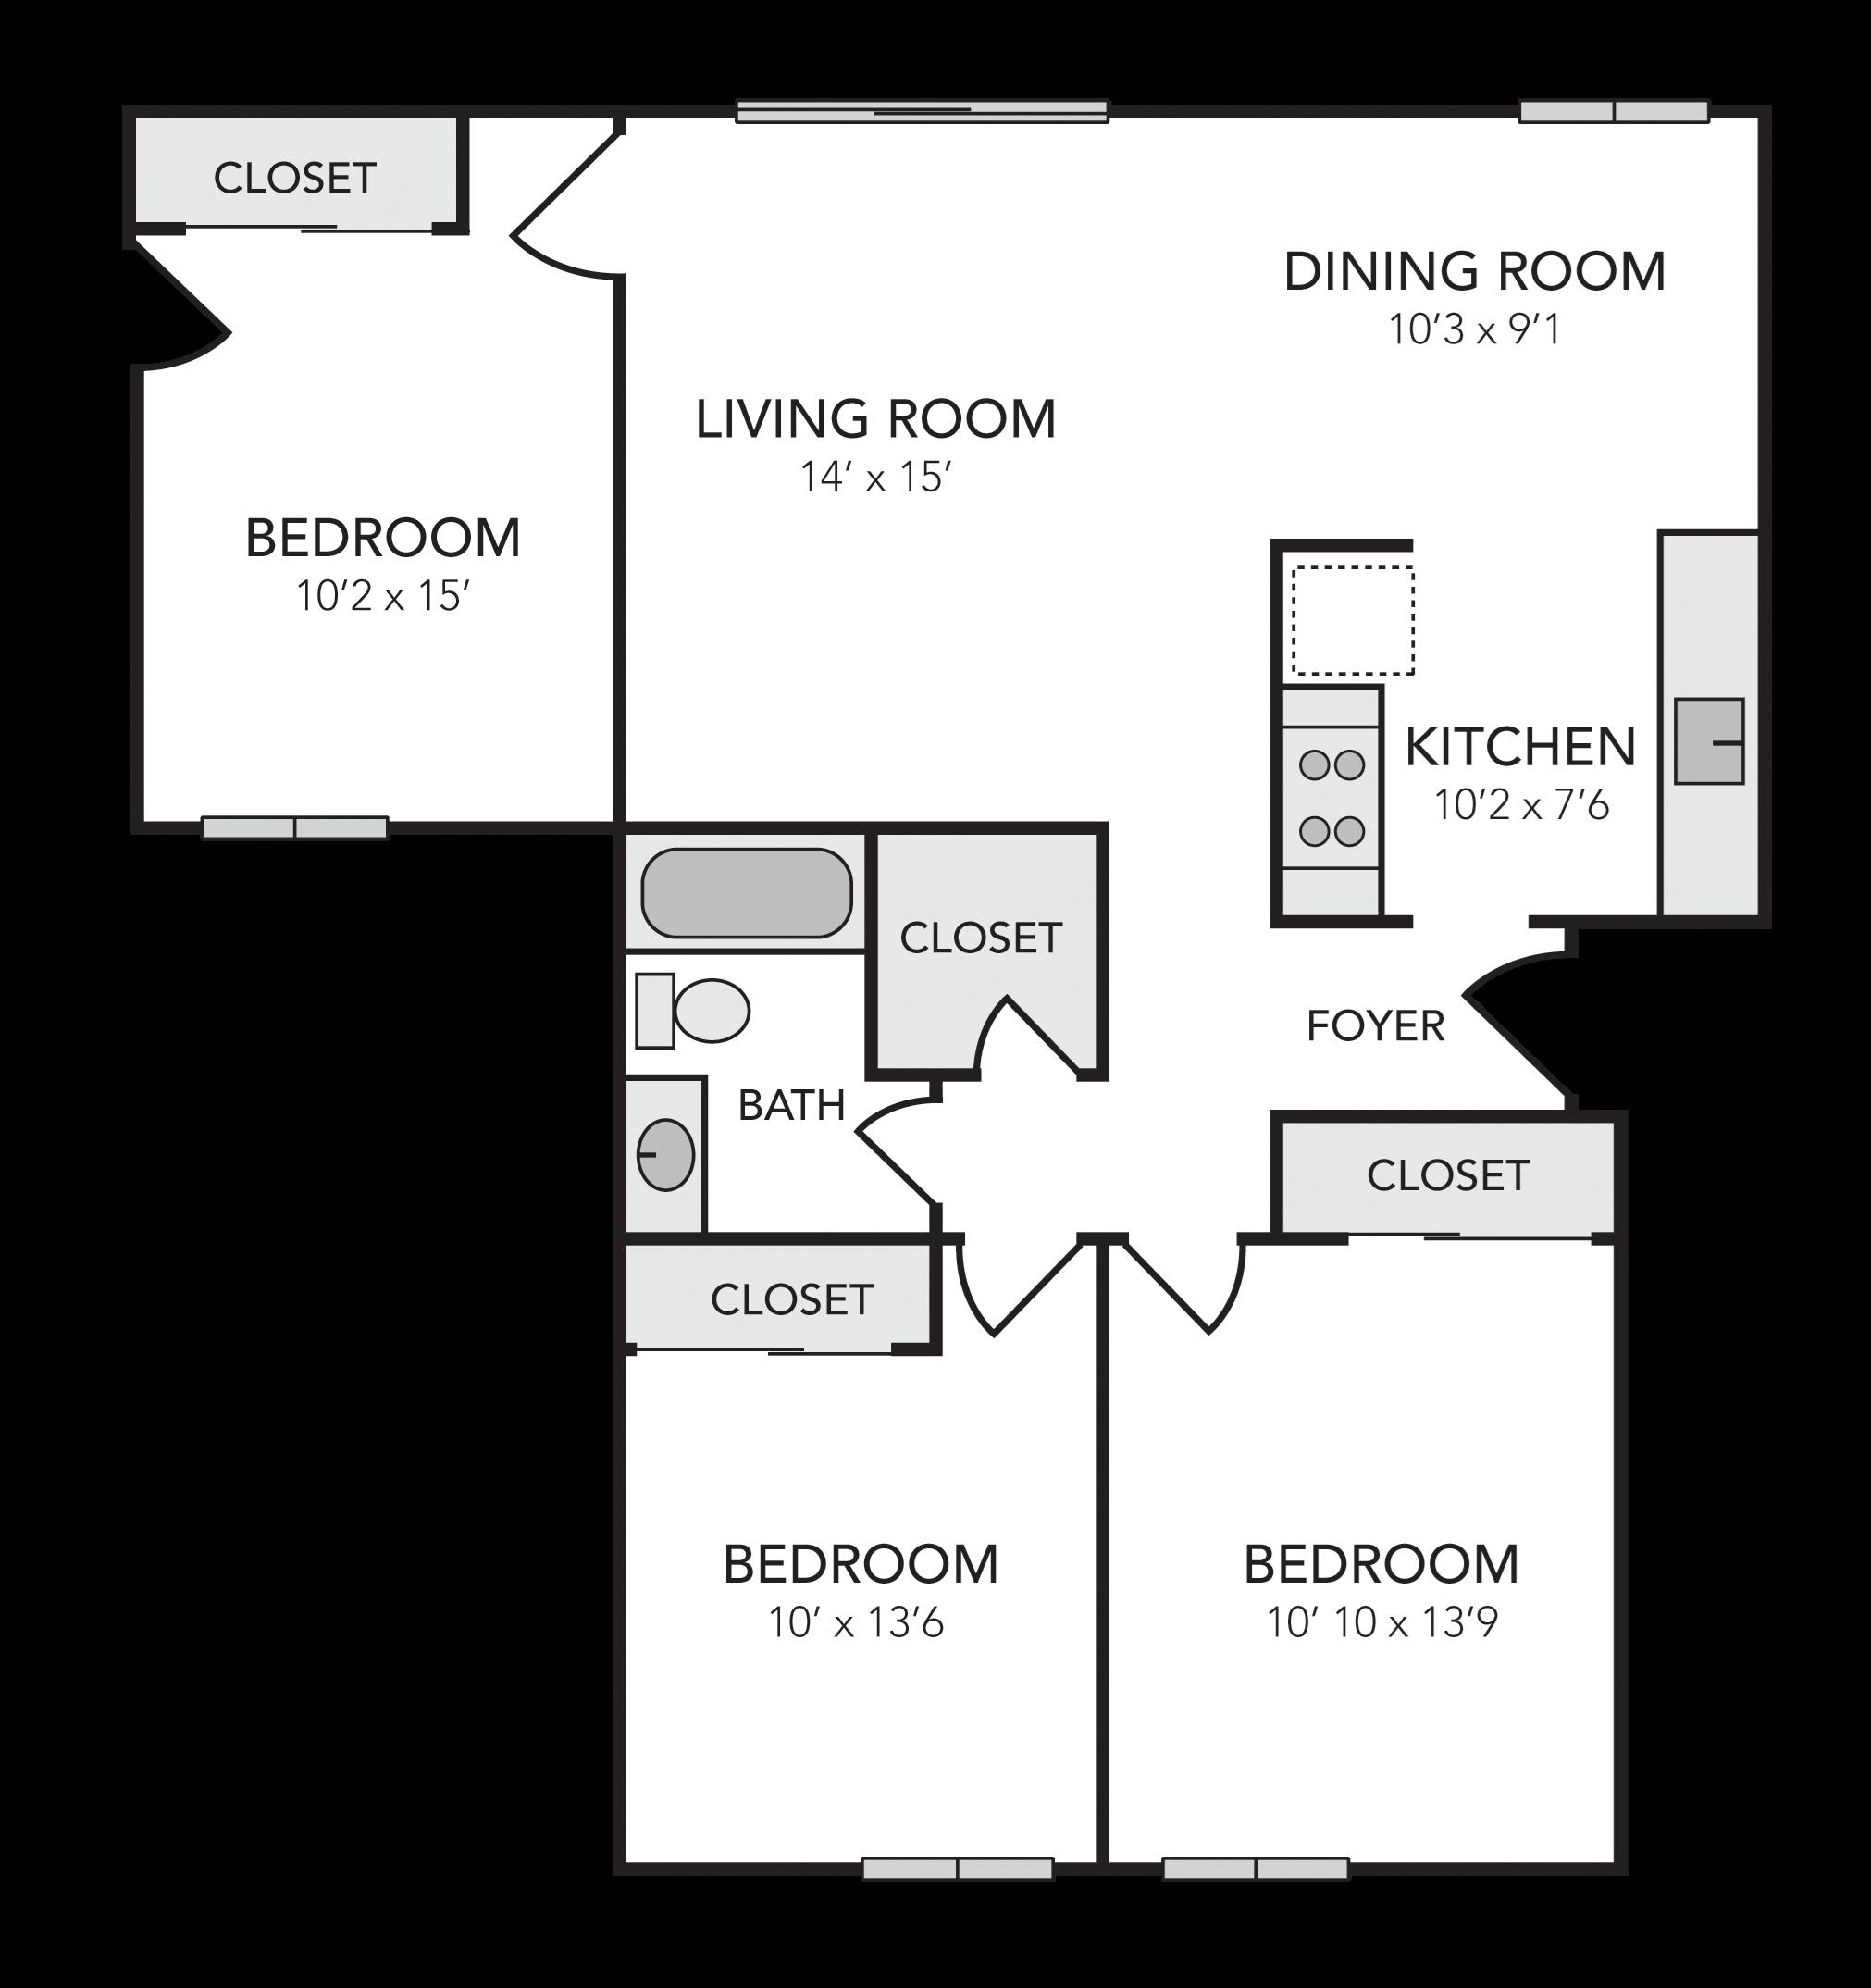 Luxury One, Two, & Three Bedroom Apartments Walnut Creek, CA